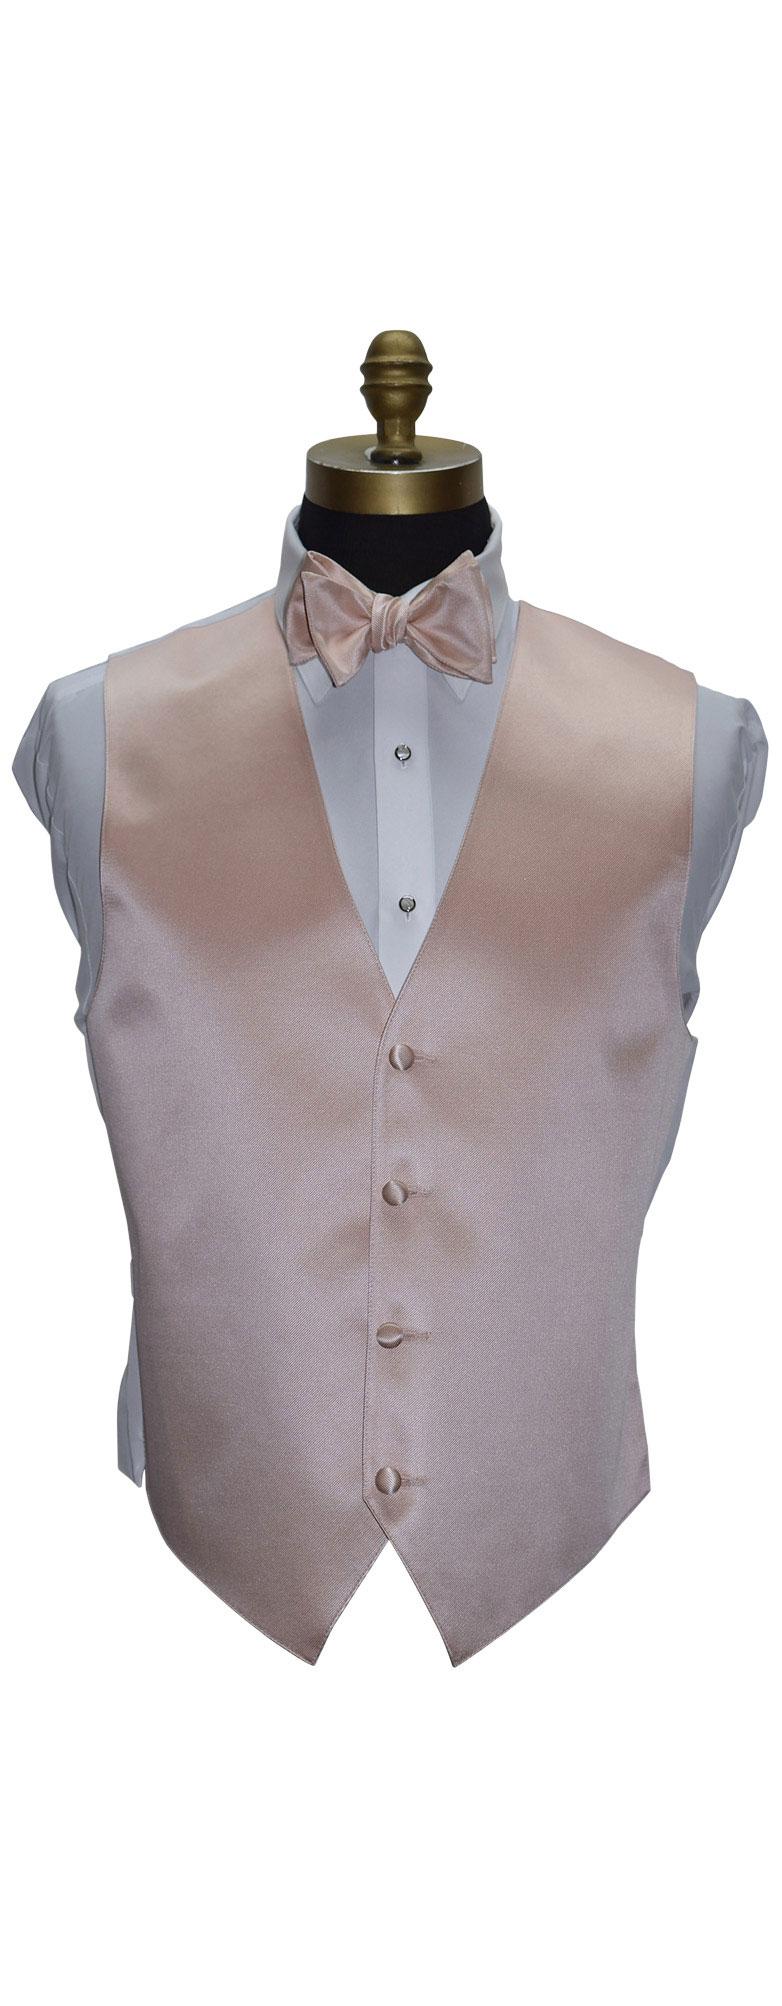 Petal Tuxedo Vest Only